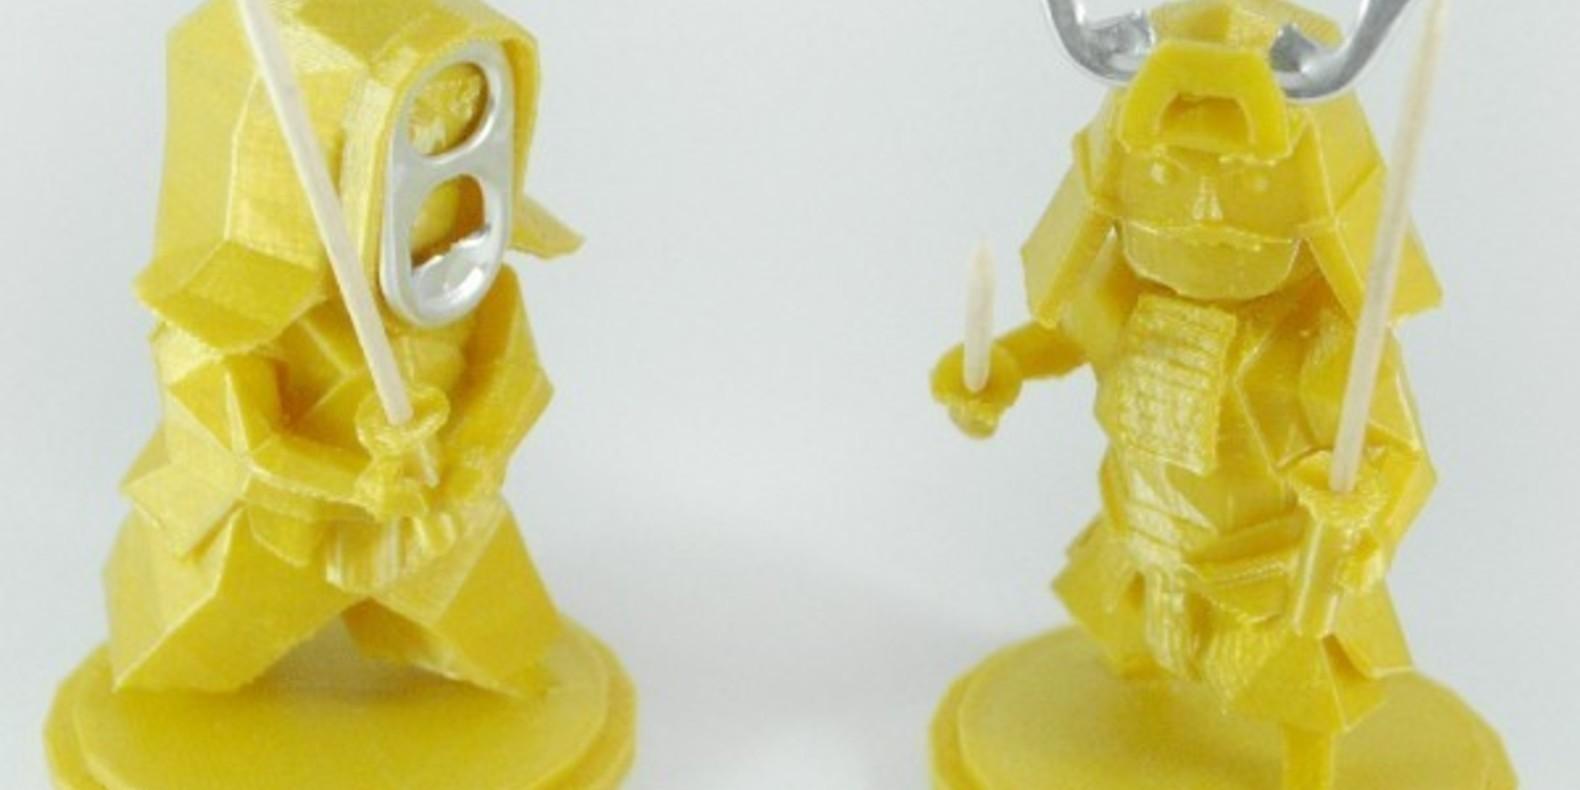 guerriers ninja cults 3D fichier 3D impression atomicosstudio tab capsule warriors 3